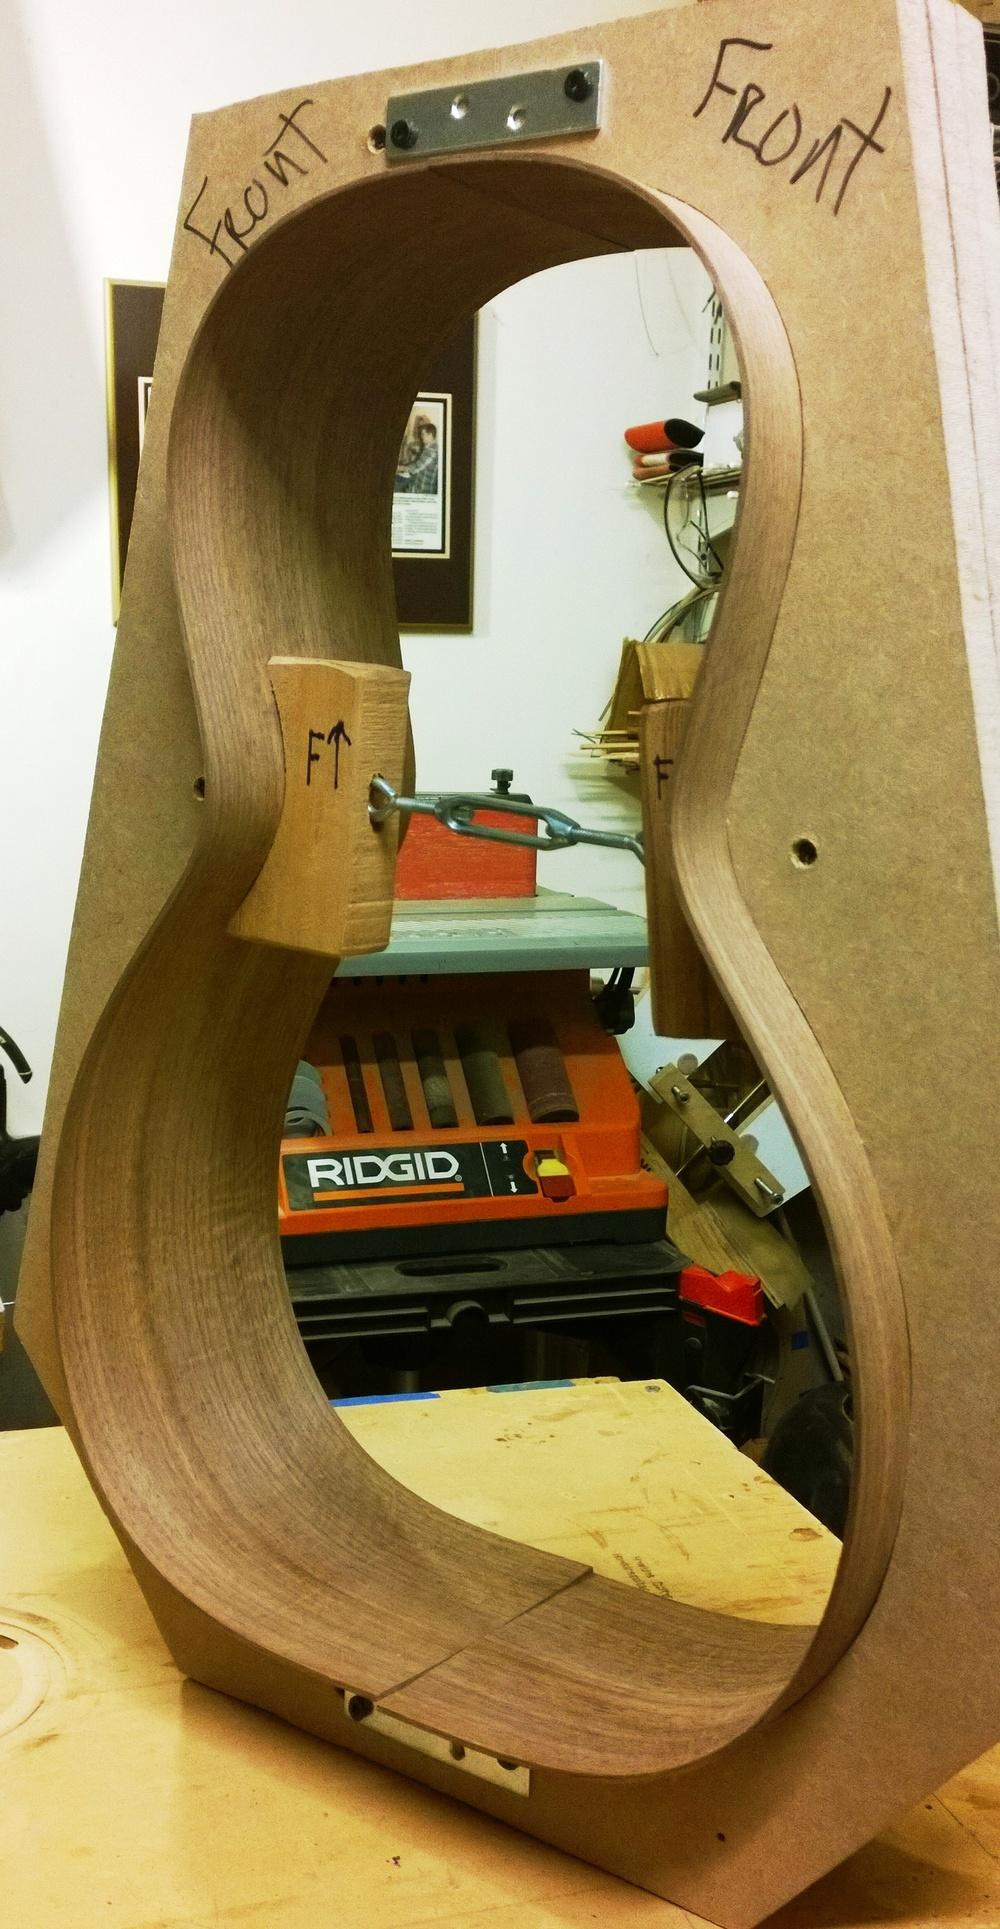 Hawkins Parlor GuitarSide Mold